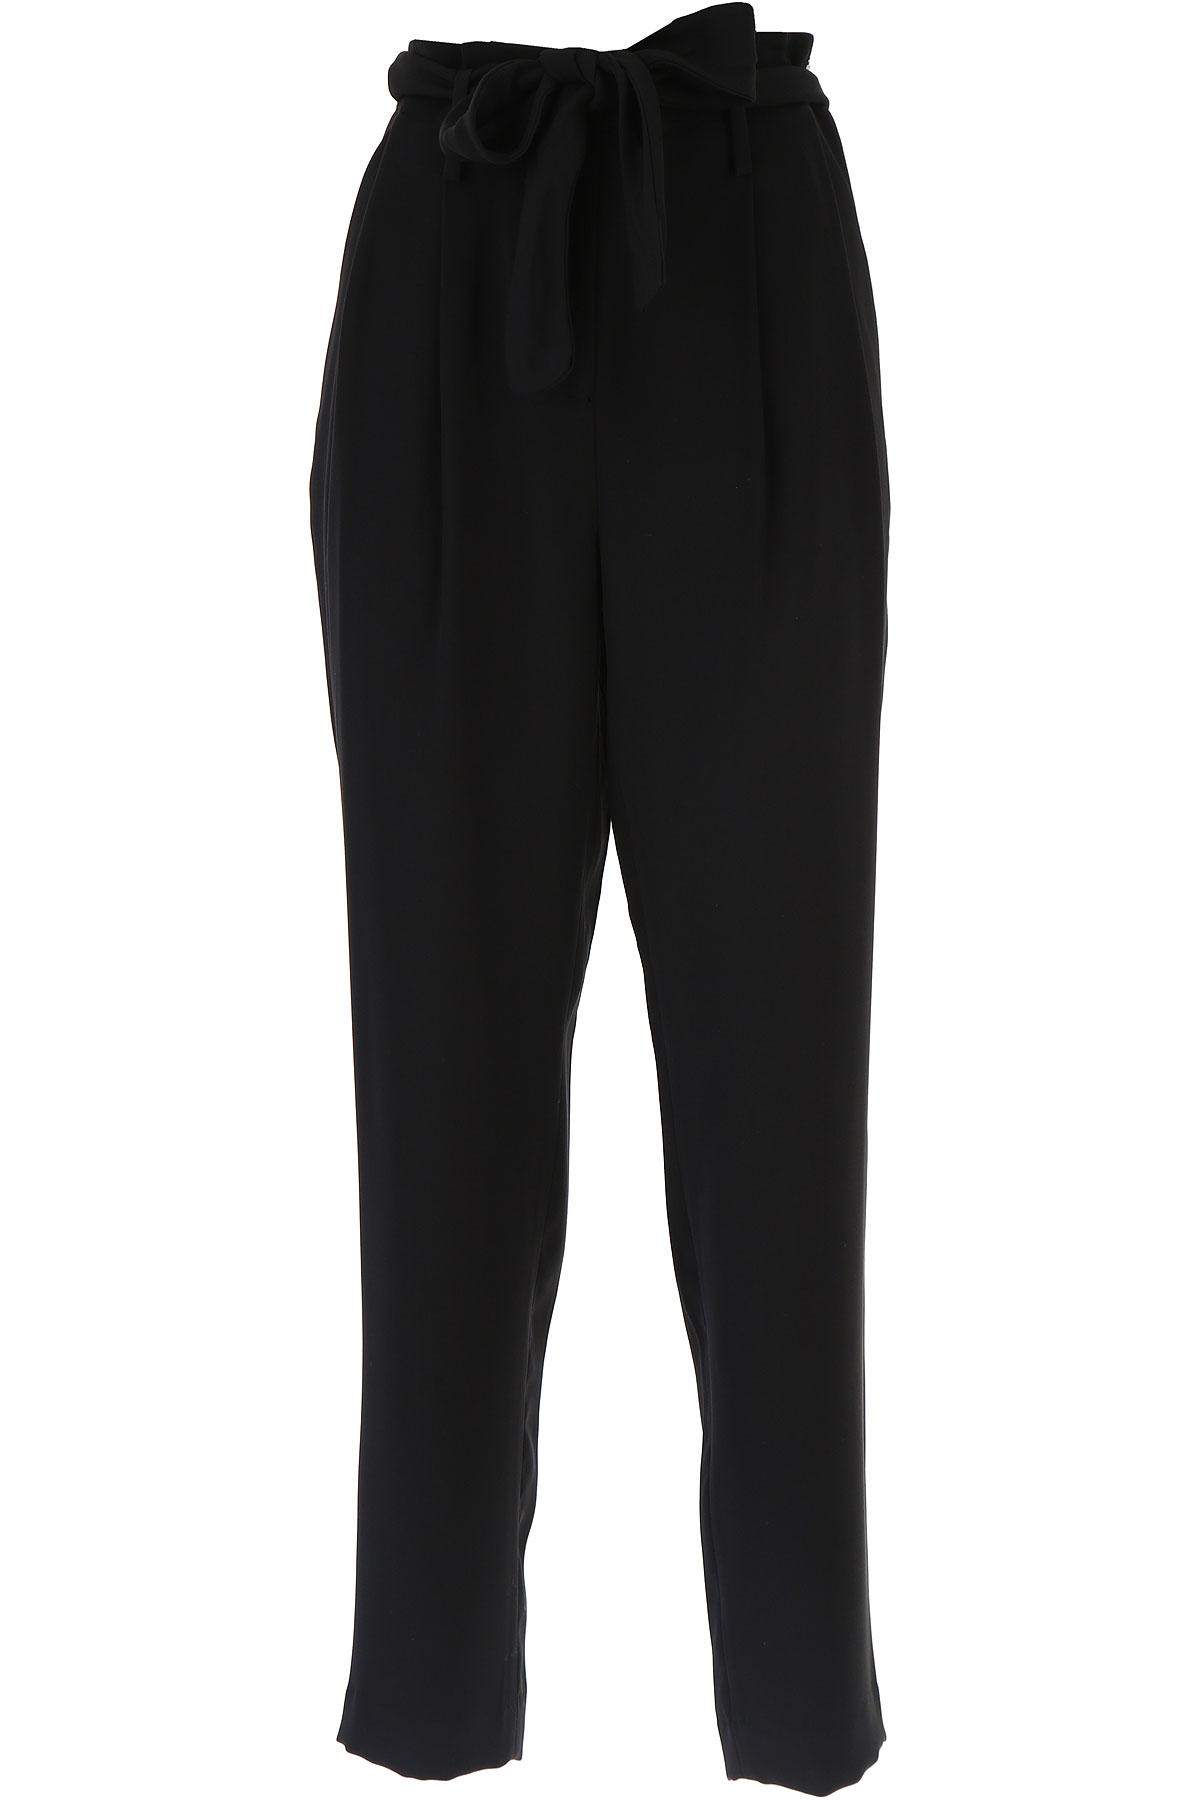 Michael Kors Pantaloni Donna In Saldo, Nero, polyester, 2019, 38 40 42 46